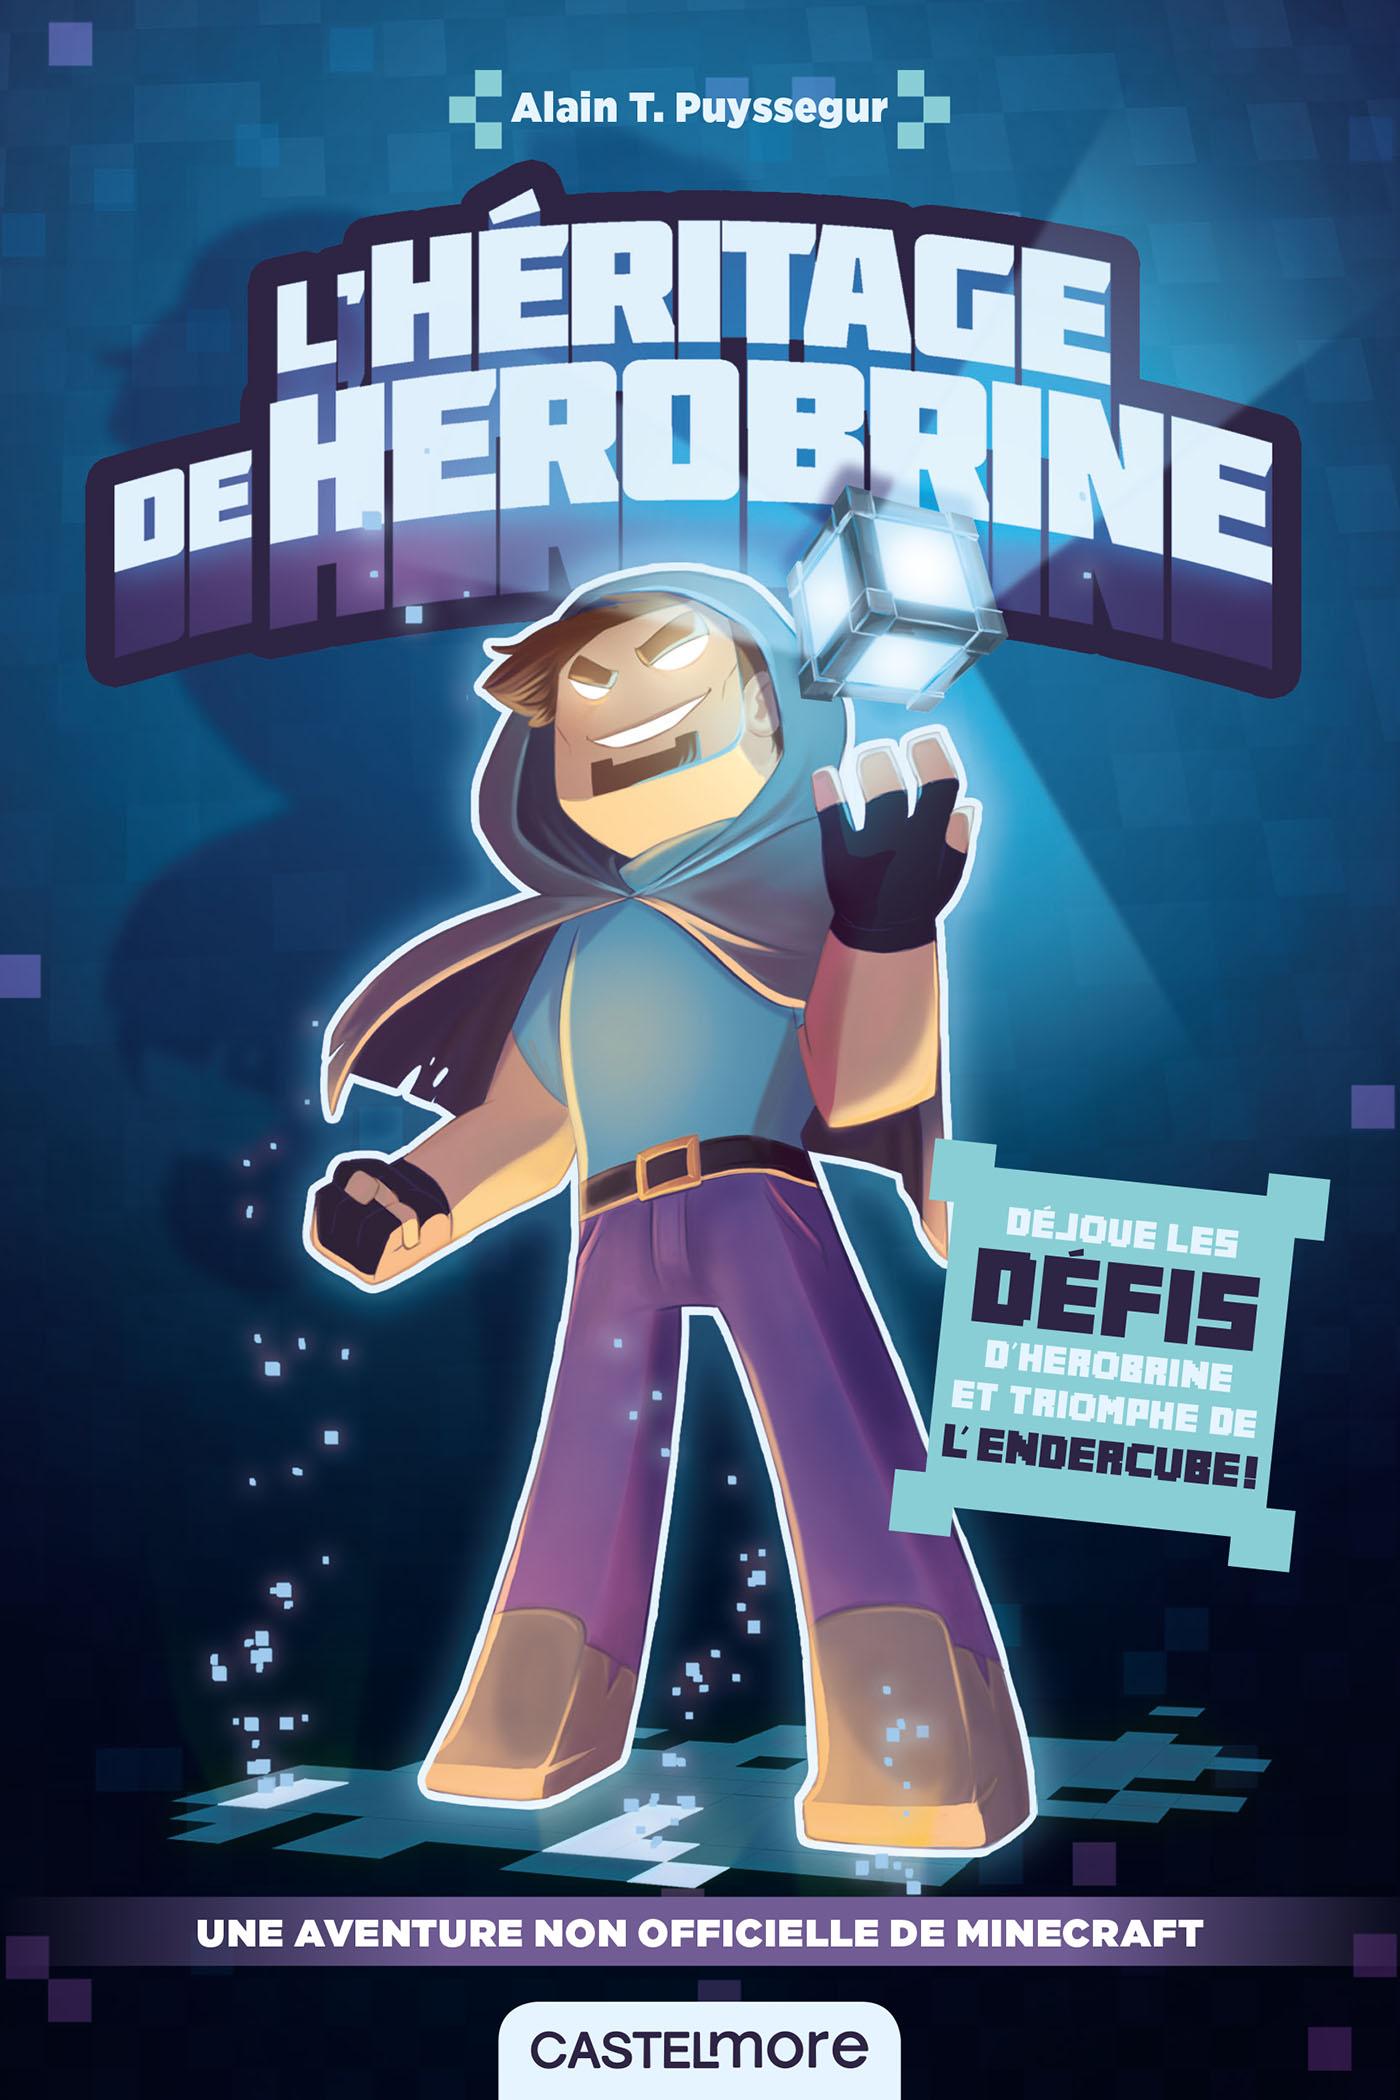 Minecraft Couv%20LHeritage%20dHerobrine_org